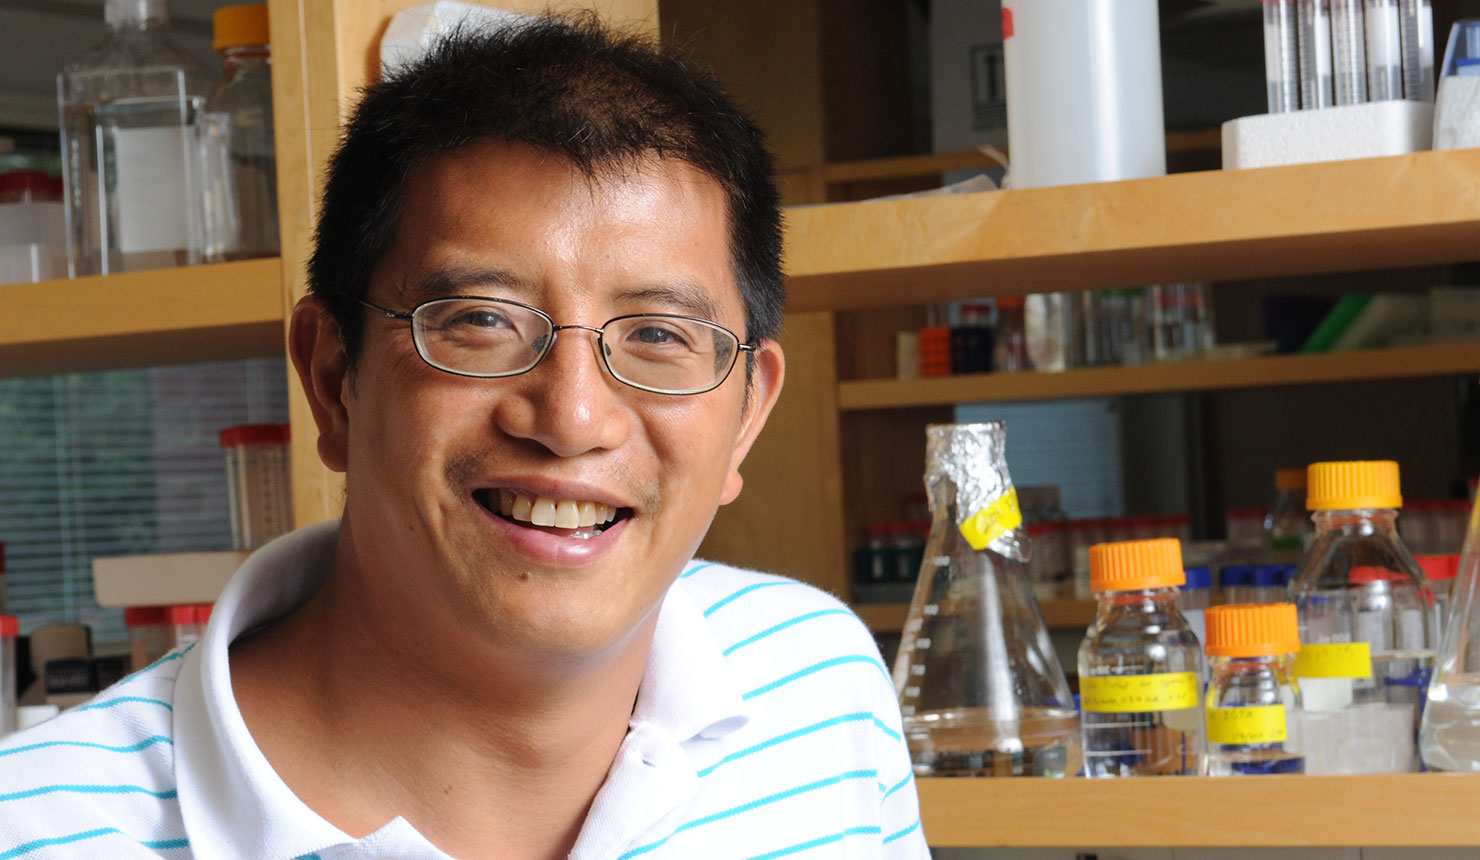 Surachai Supattapone (photo by Jon Gilbert Fox)